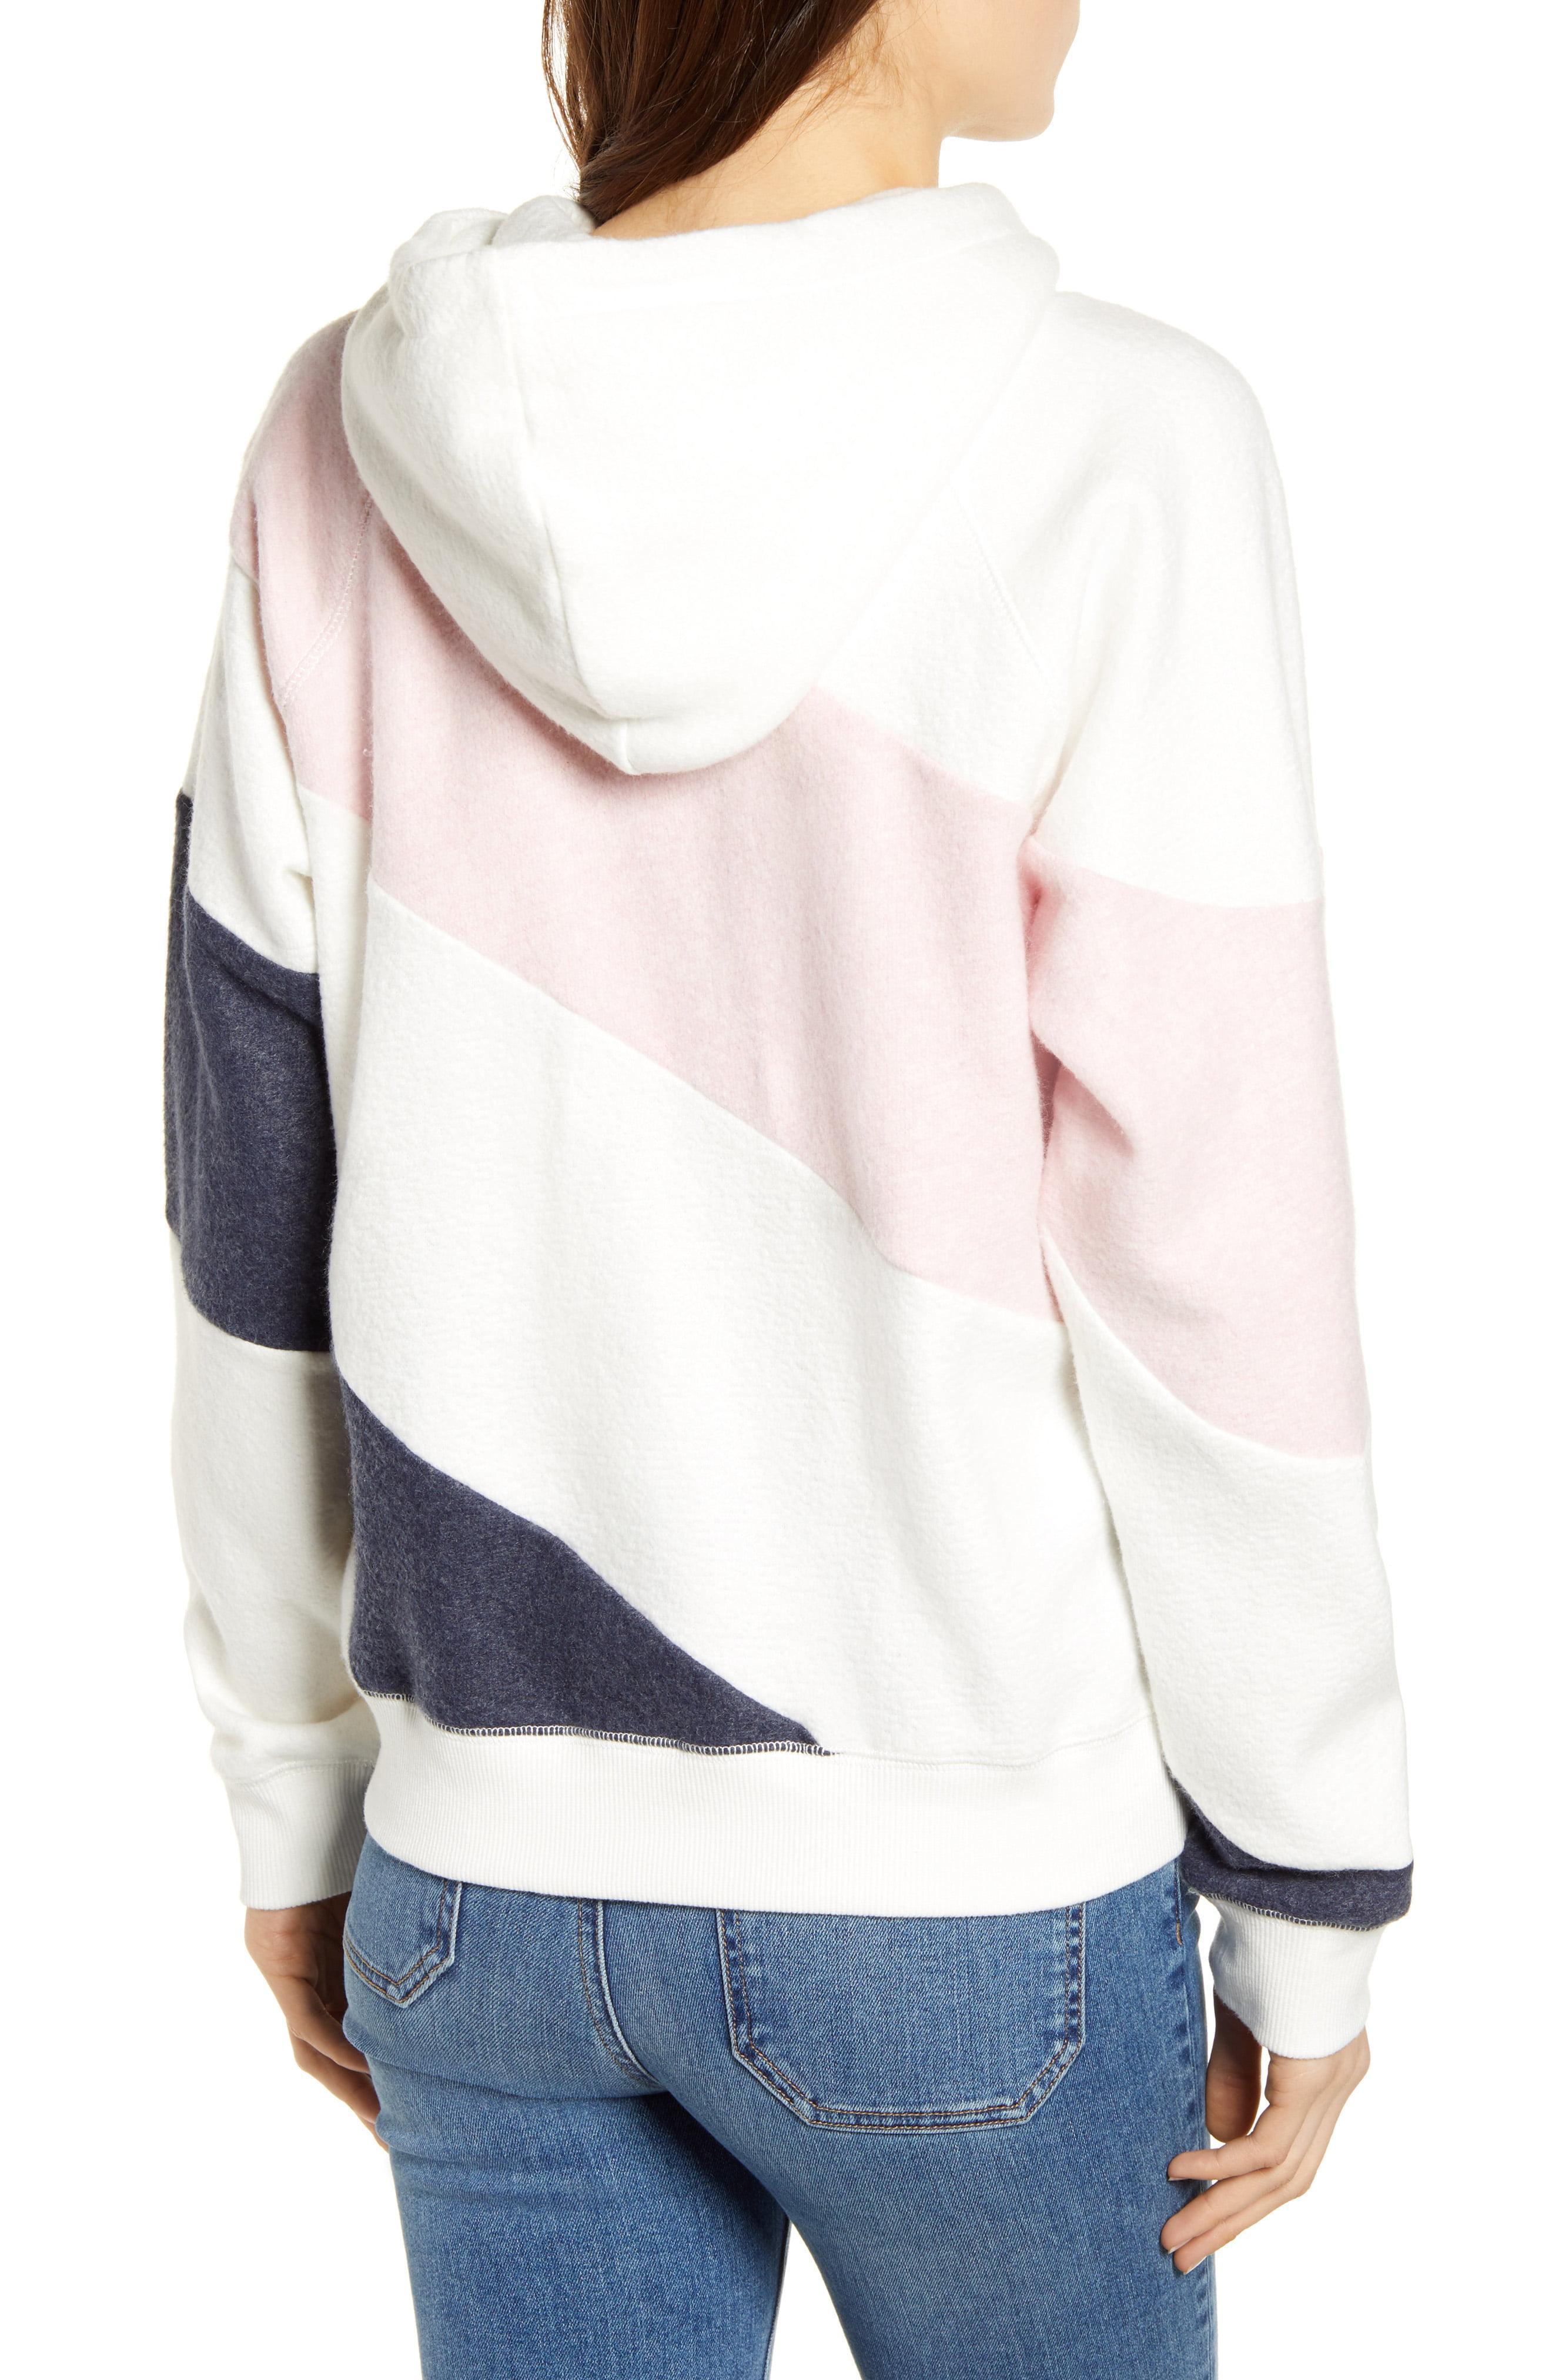 Ripple to The Moon Mens Hooded Sweatshirt Pullover Hoodies Sweater Blouses Tops